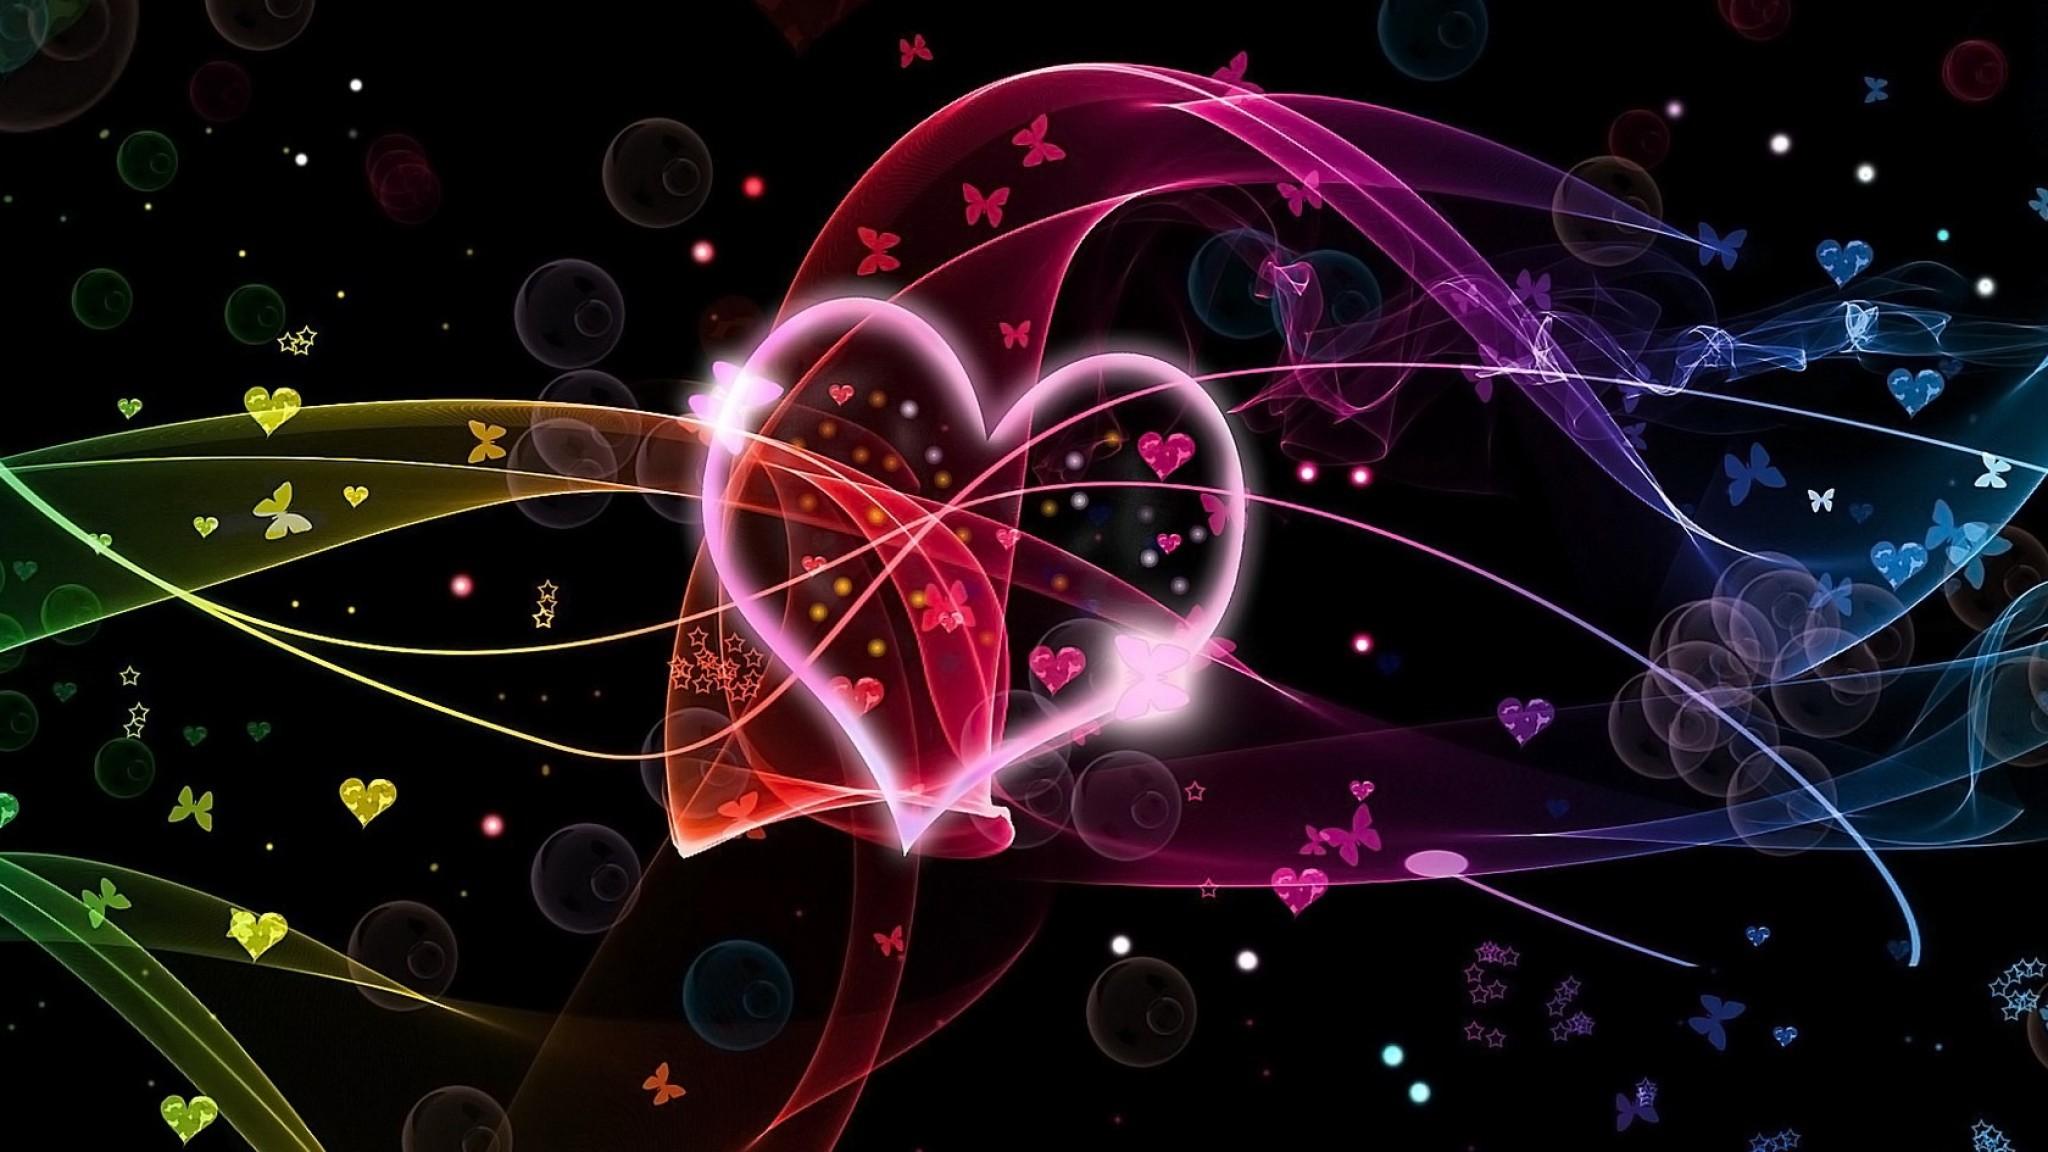 Wallpaper hearts, circles, butterflies, colorful